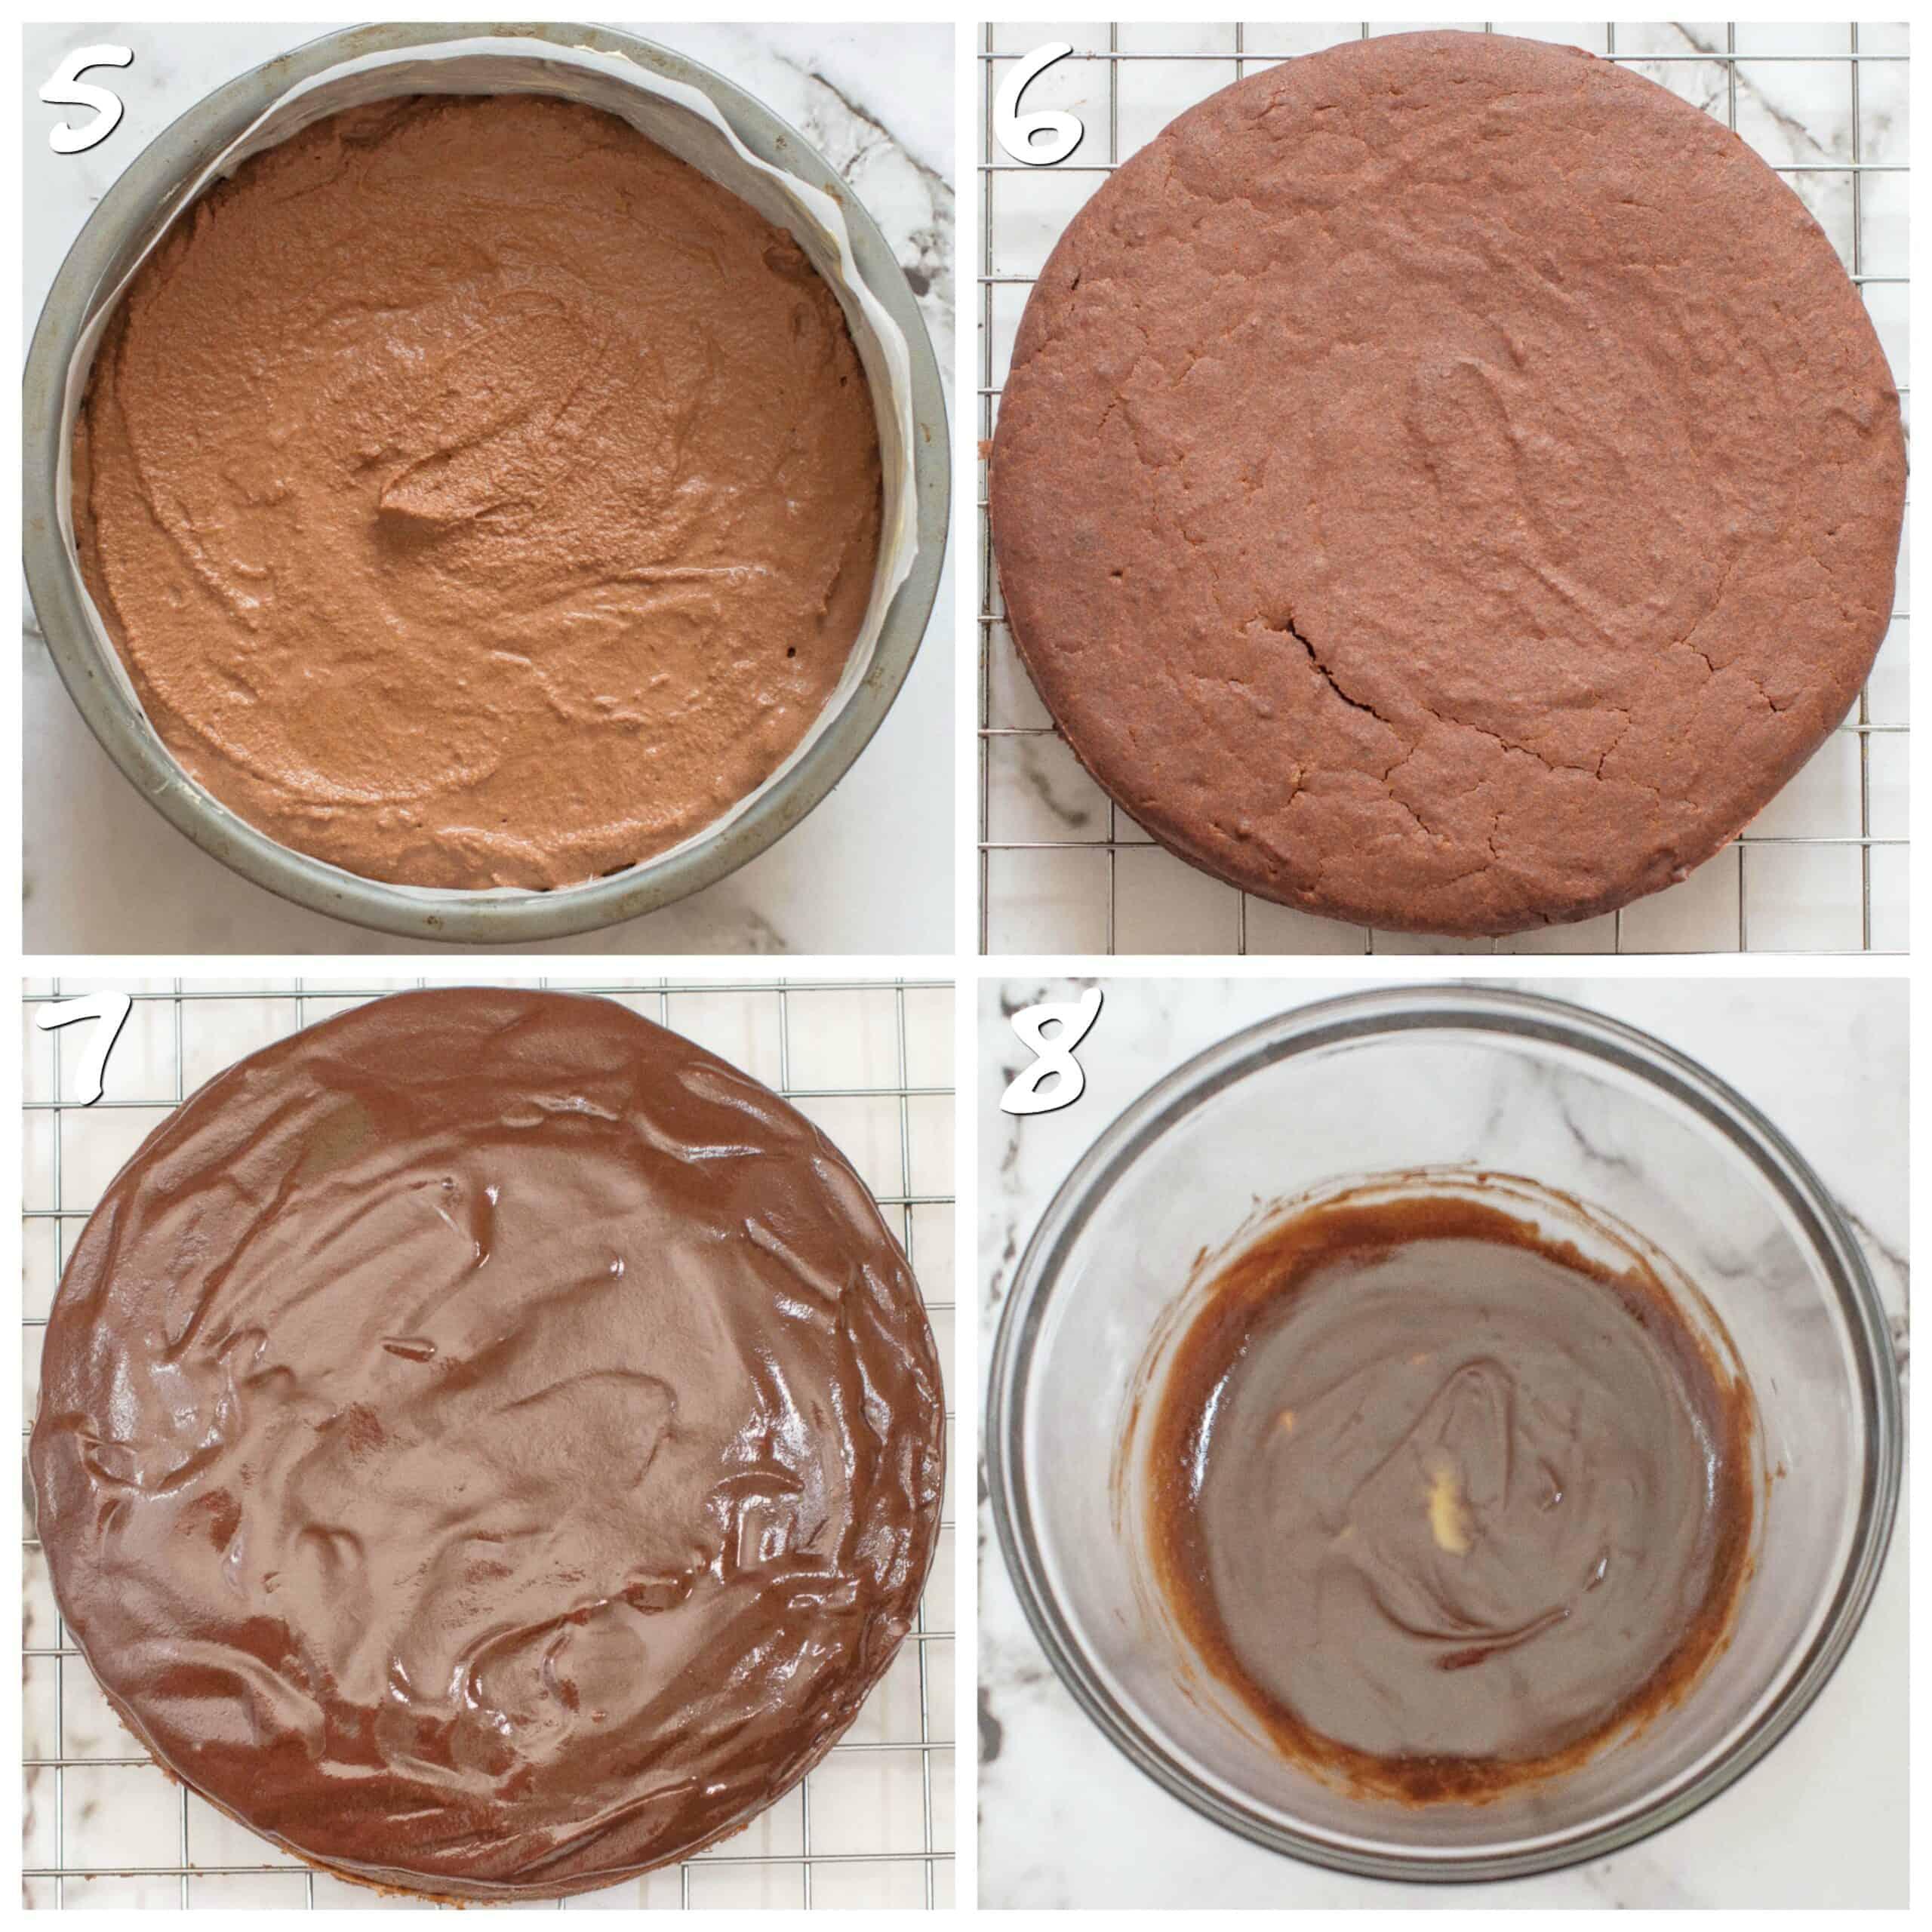 steps5-8baking the cake